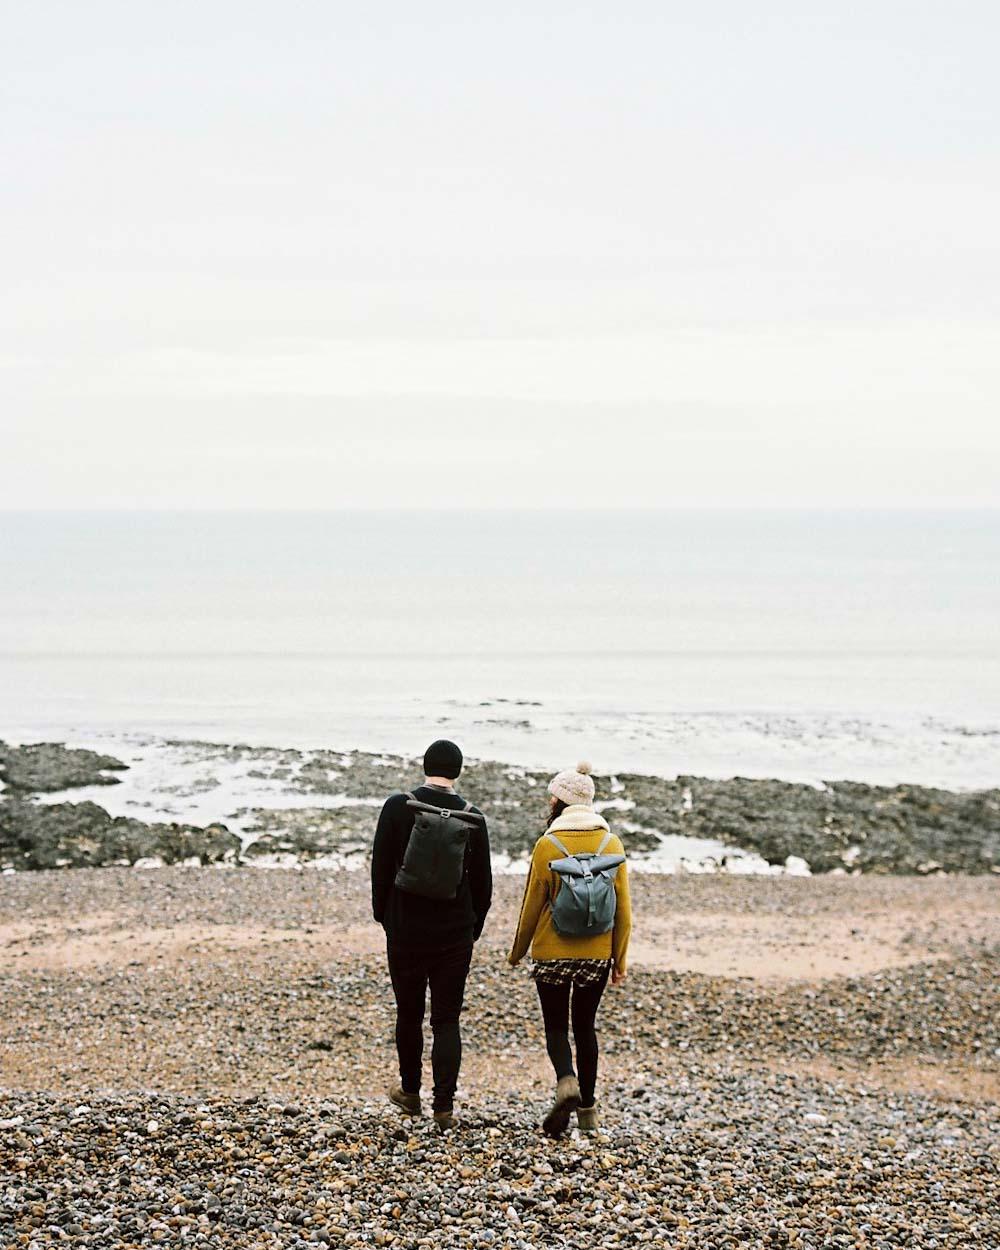 Couple on beach wearing Millican backpacks